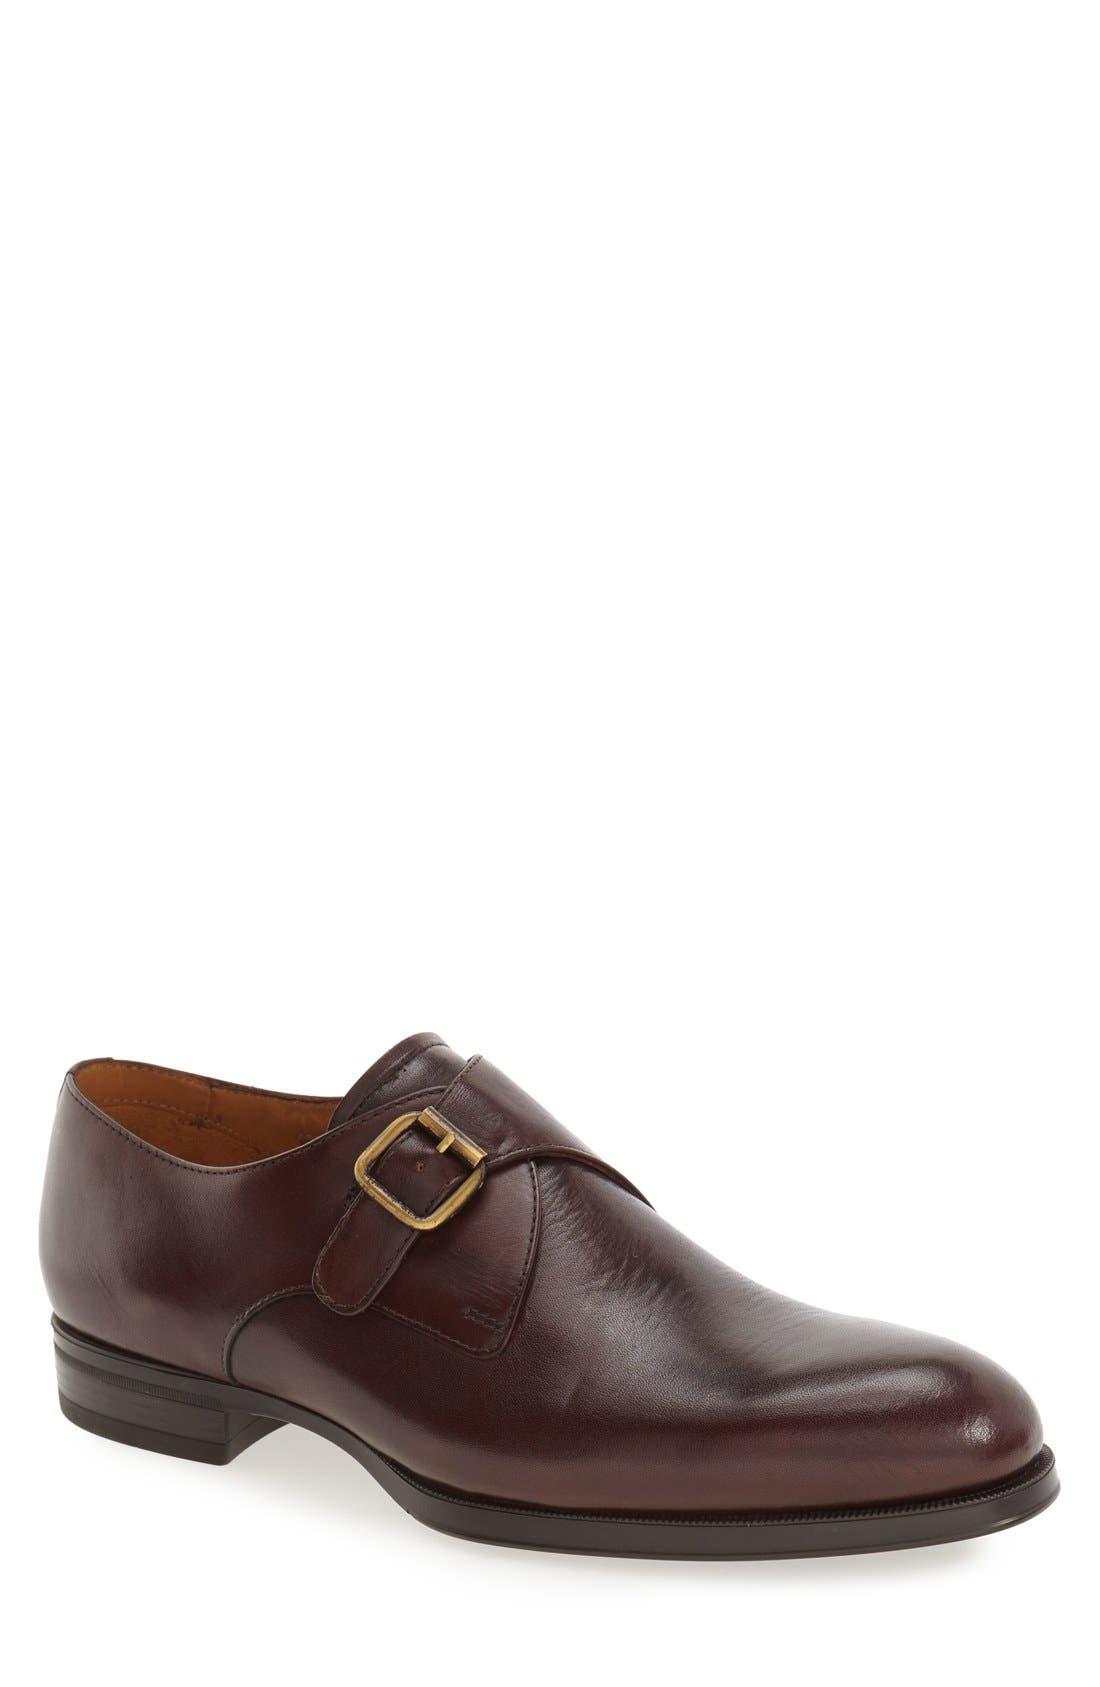 'Trifolo' Monk Strap Shoe,                         Main,                         color, Dark Woodbury Leather